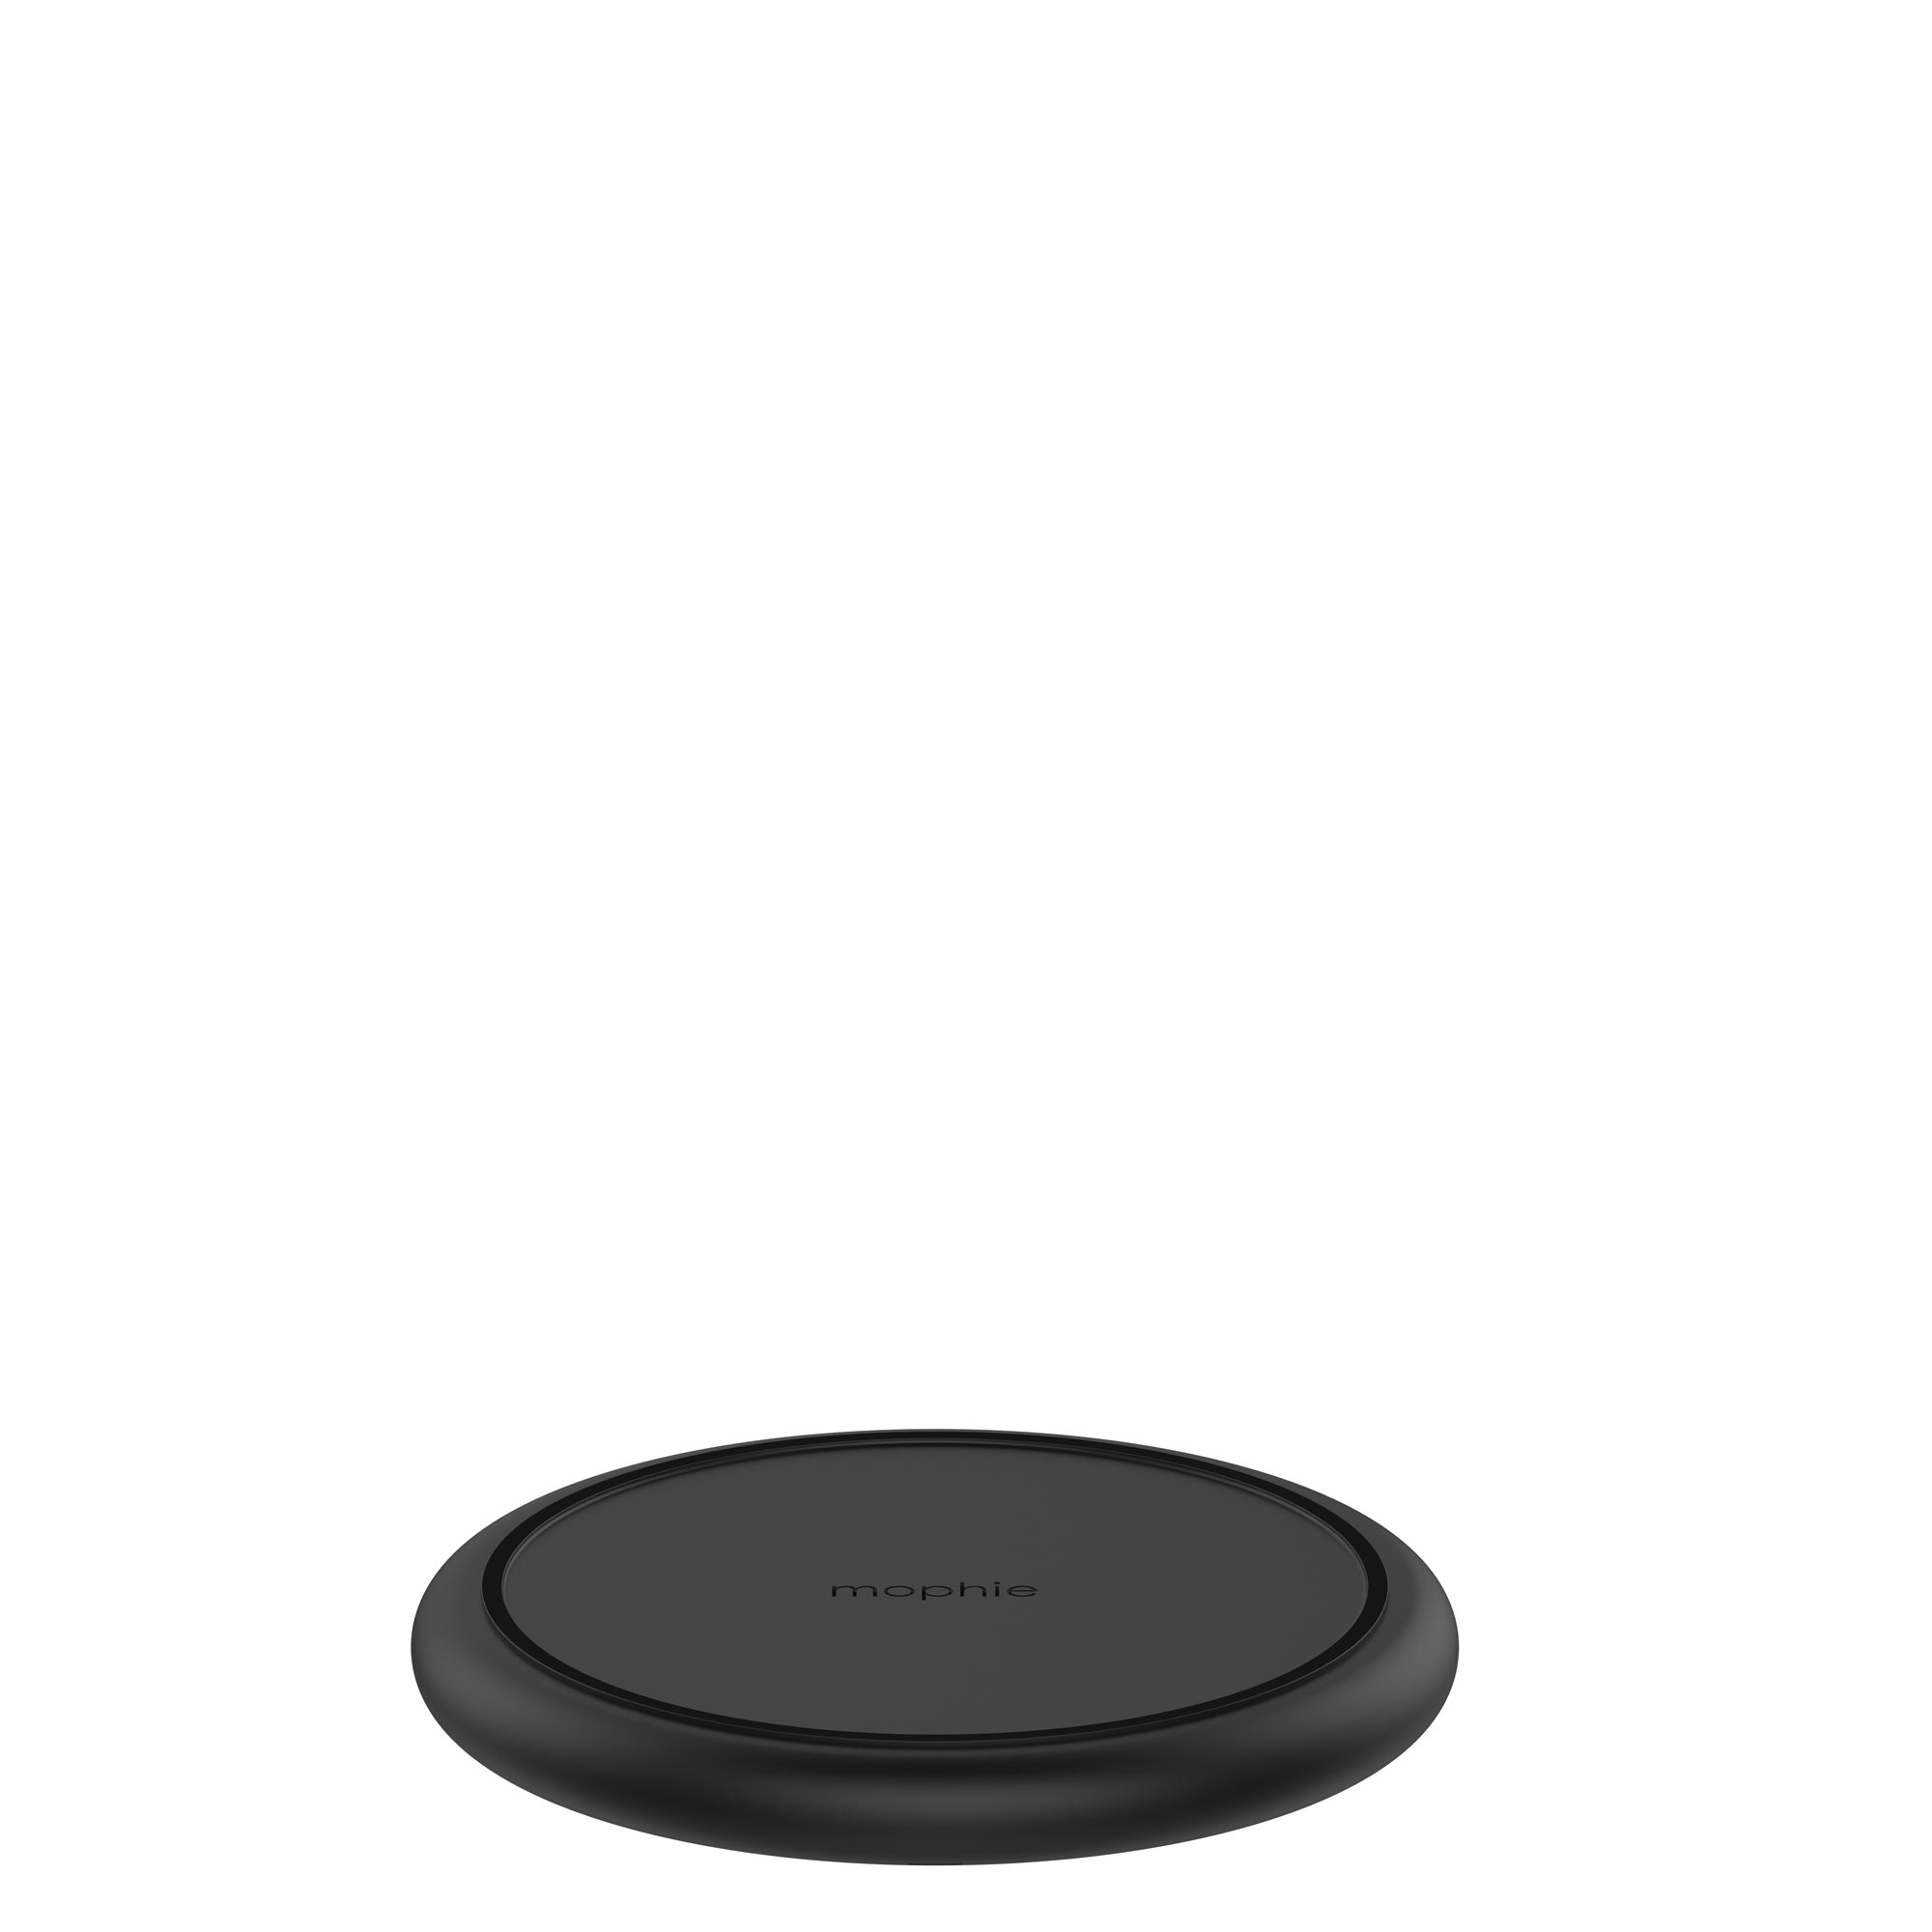 Mophie 409901484 cargador de dispositivo móvil Interior Negro